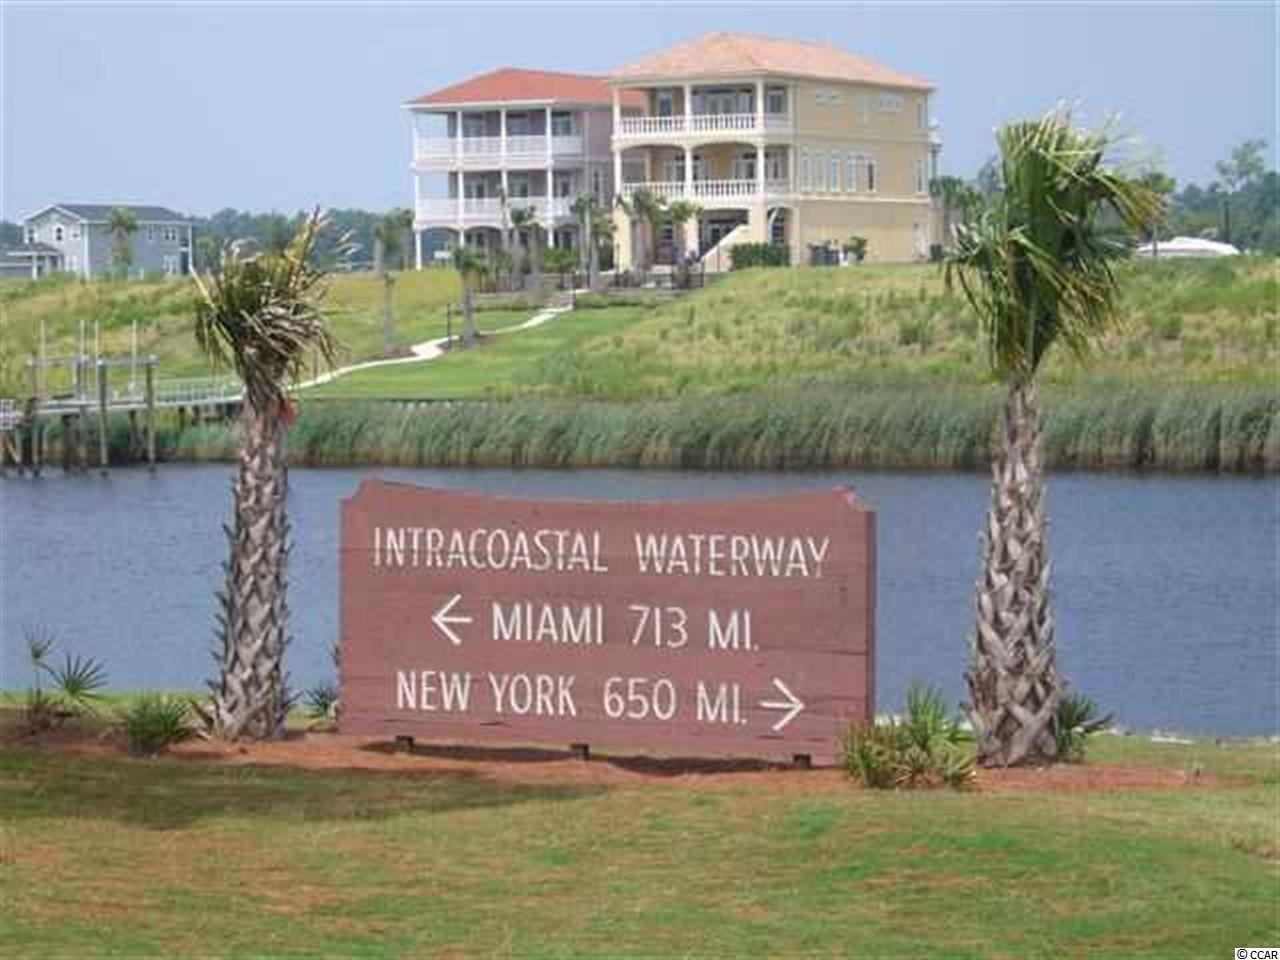 MAGNOLIA PLACE condo for sale in Myrtle Beach, SC